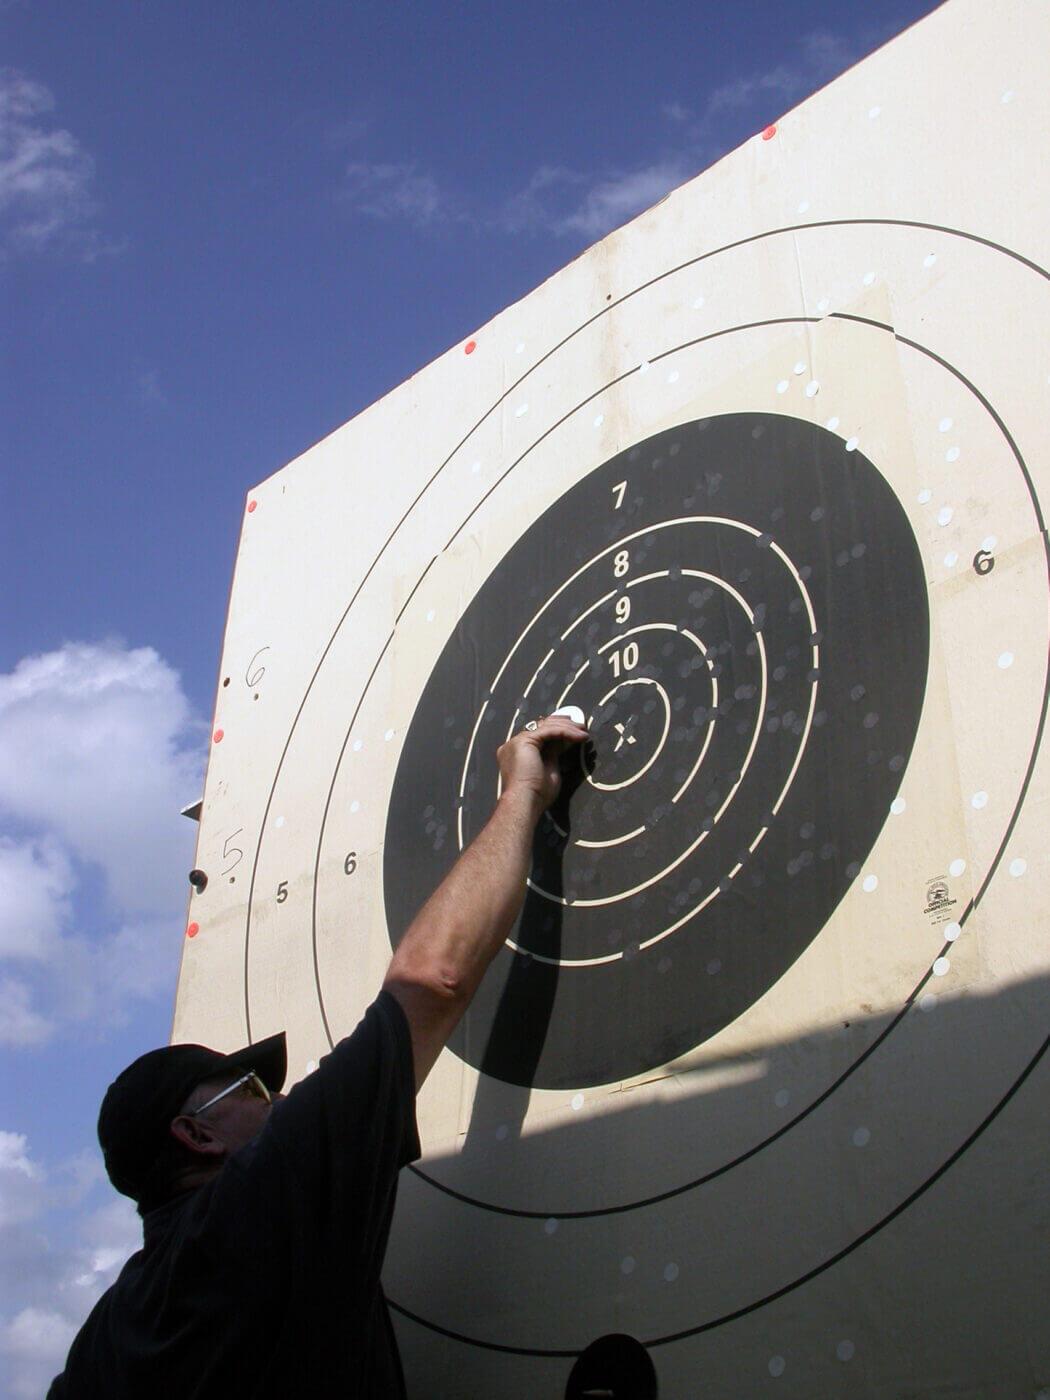 Range target practice with 7.62 NATO